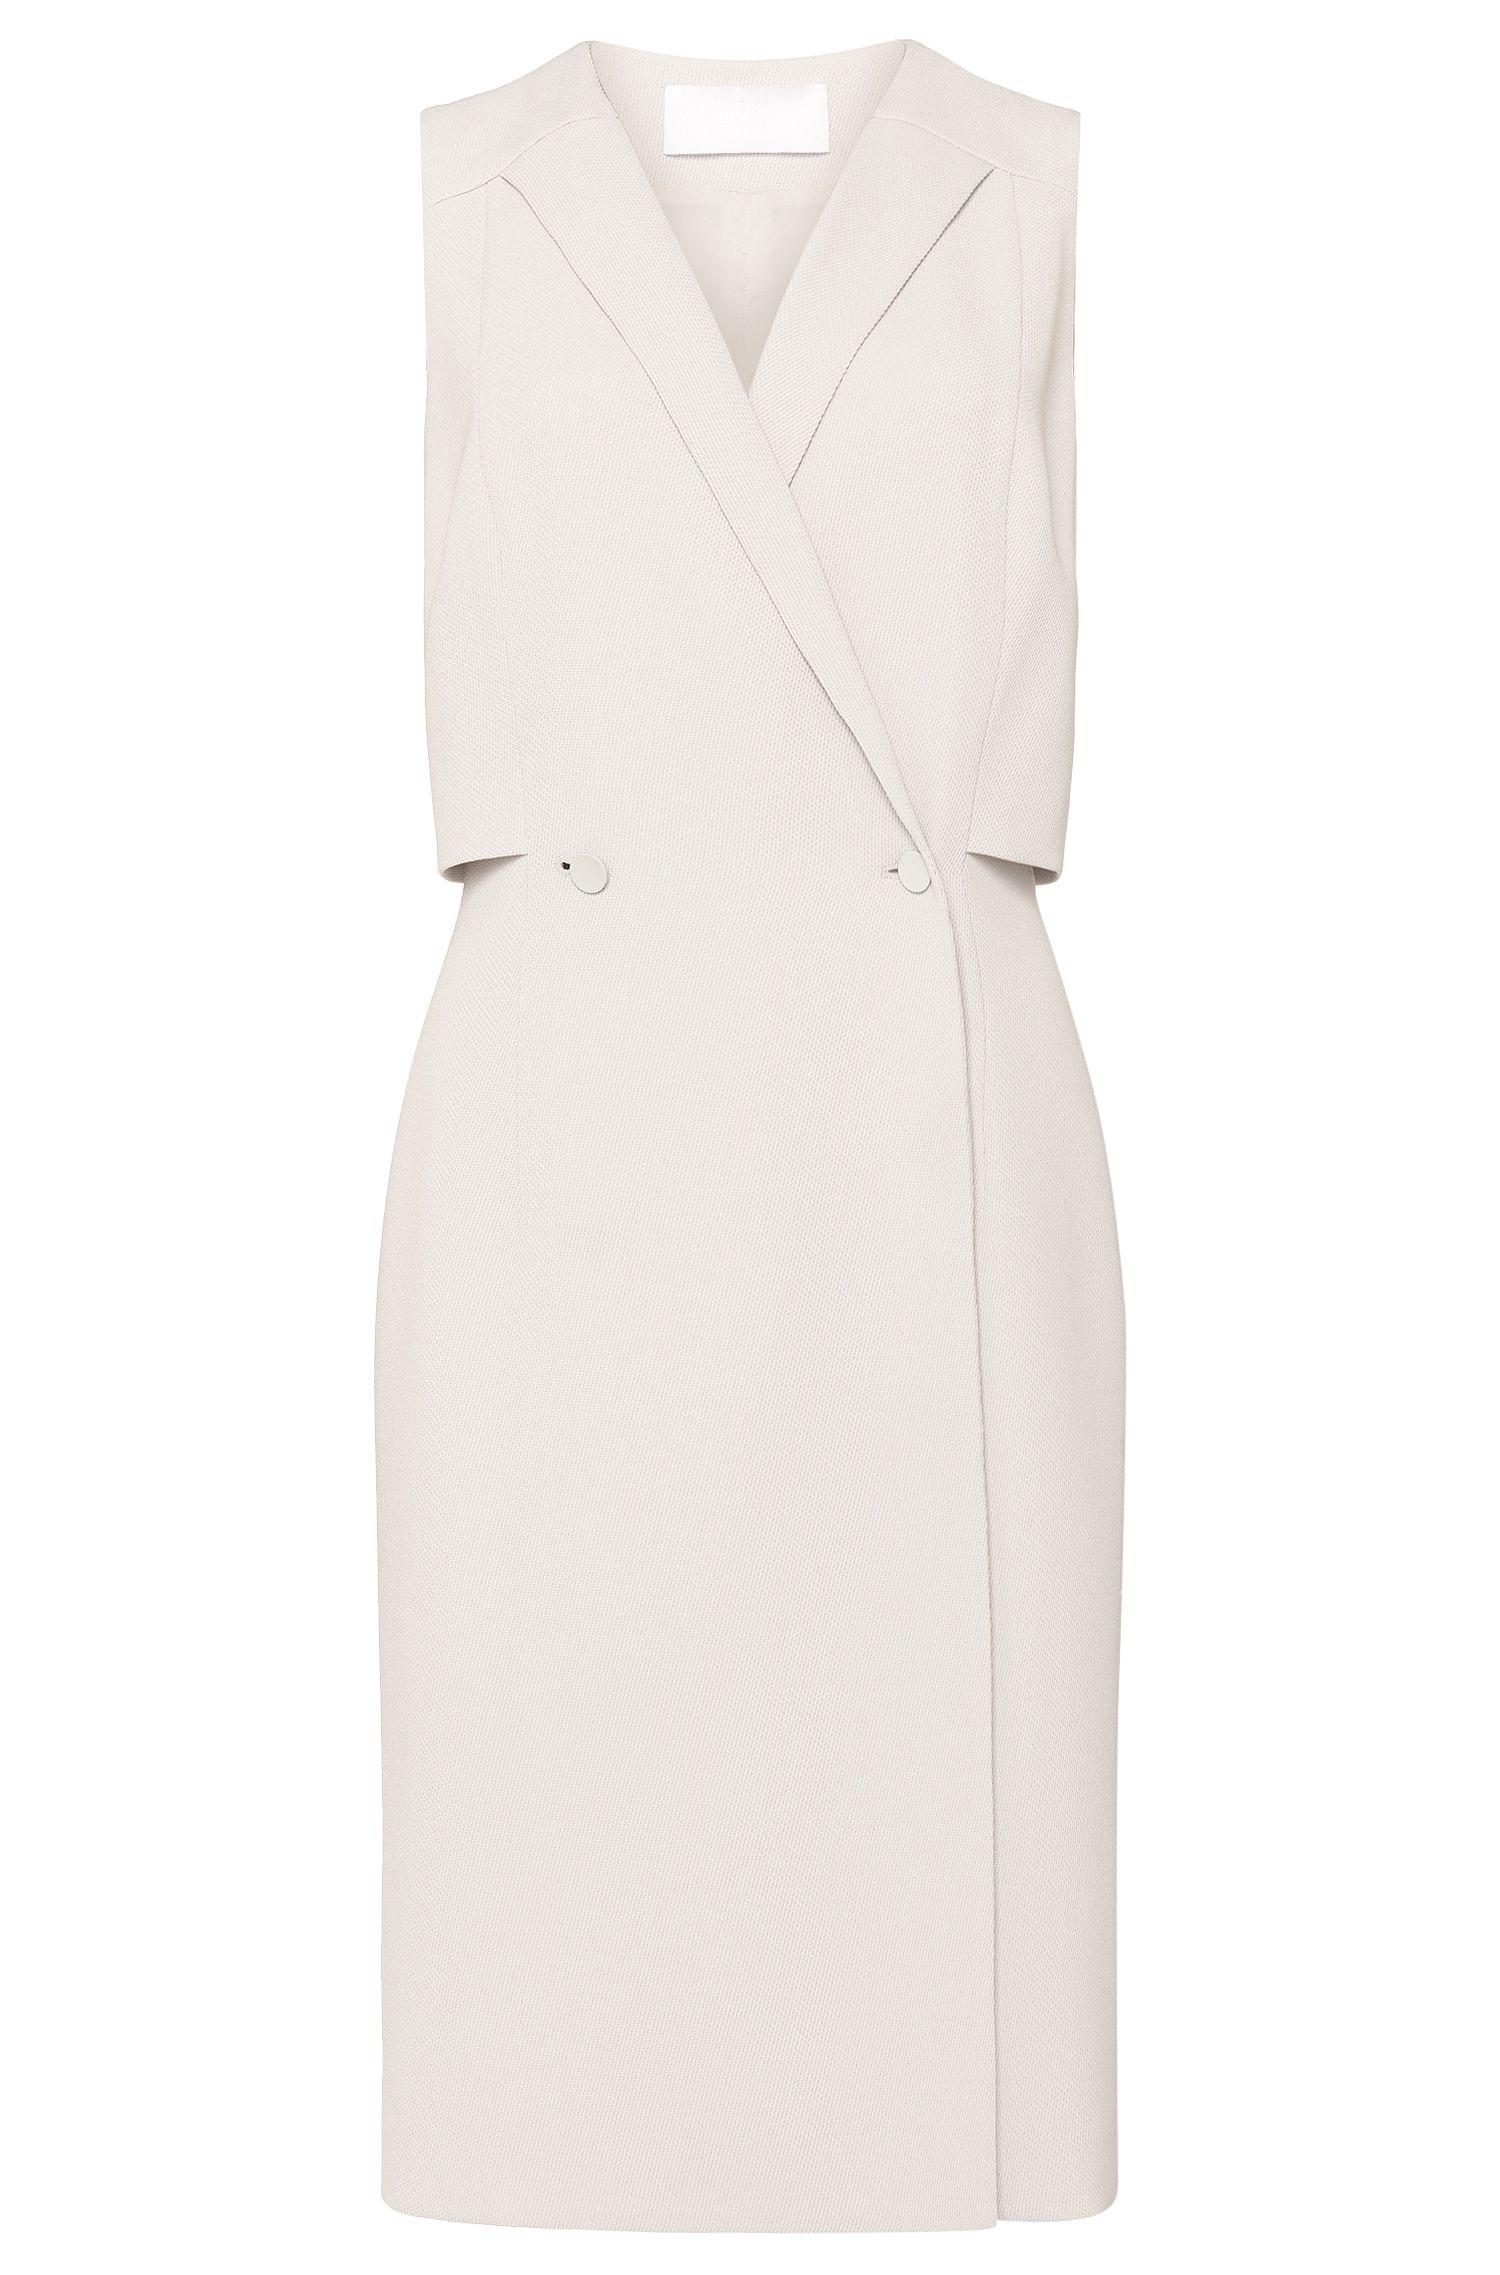 'Damarine' | Suiting Wrap Sheath Dress